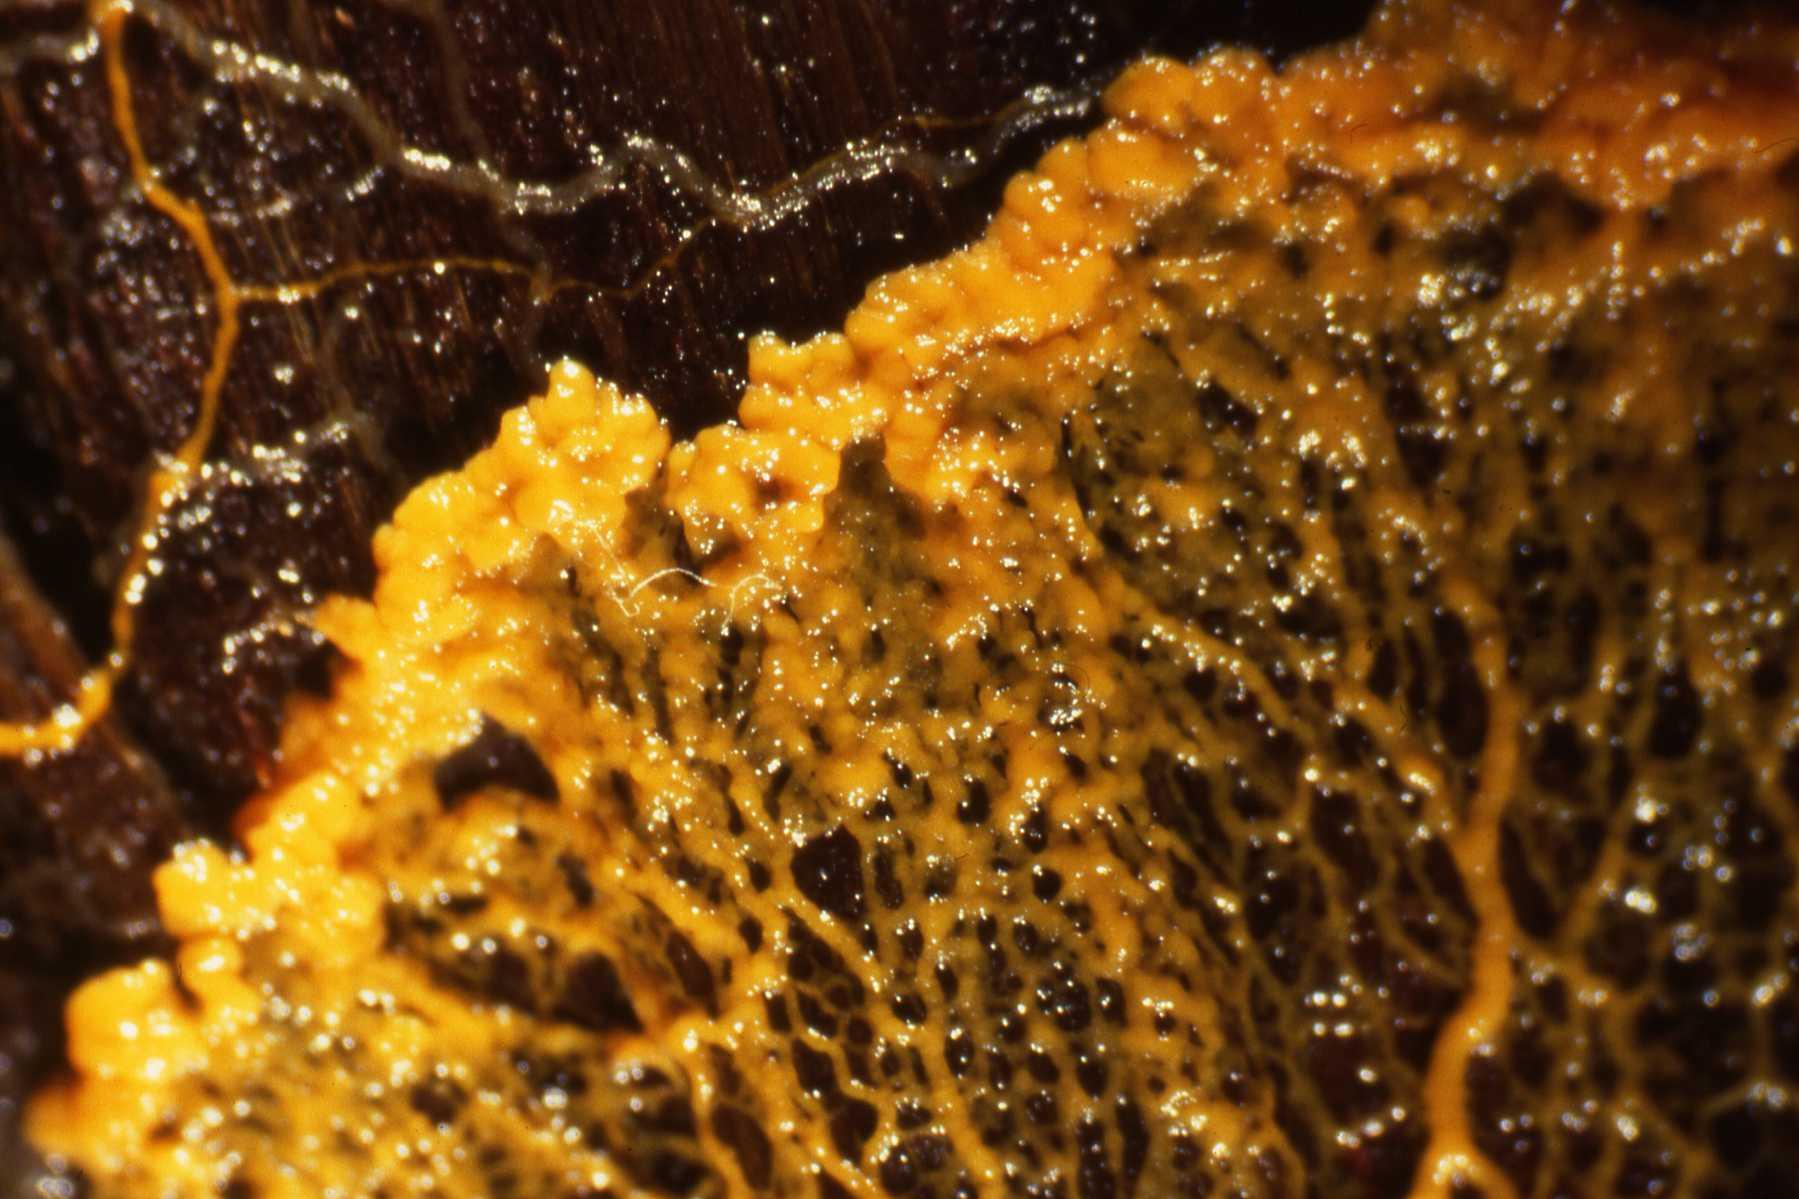 Слизевик Physarum polycephalum